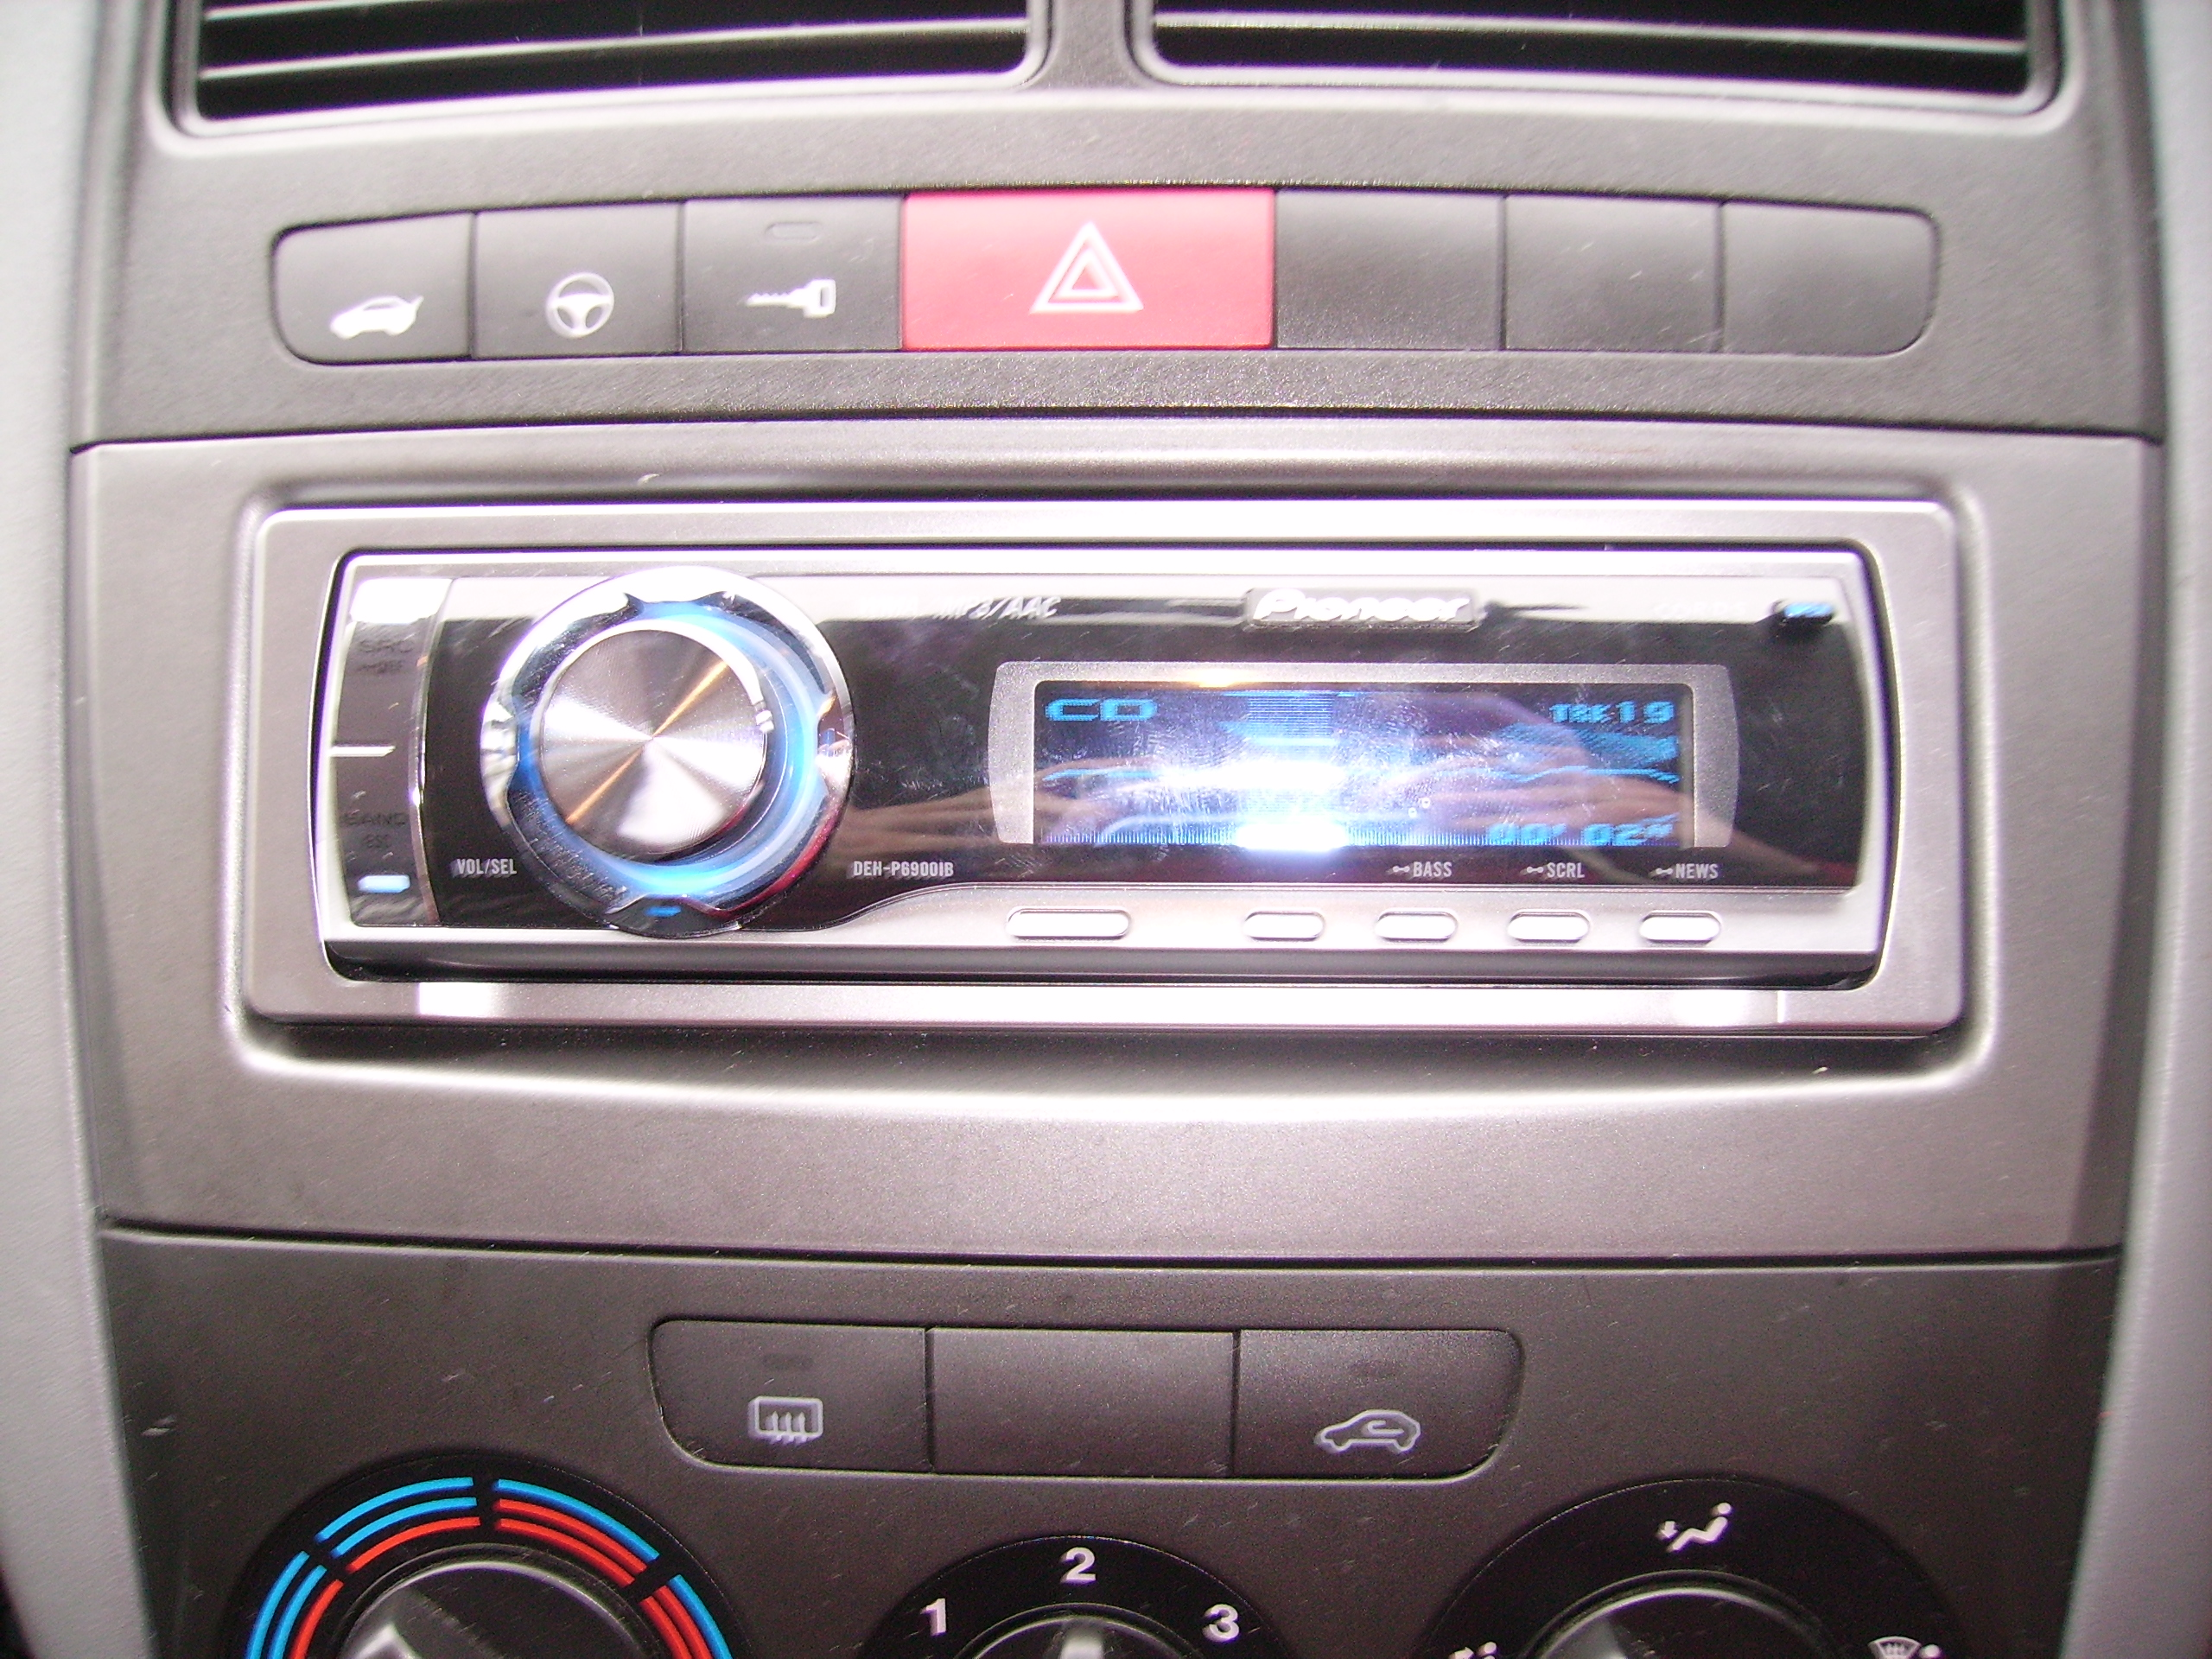 Fiat Punto Active Fuse Box : Grande punto fiat active the forum